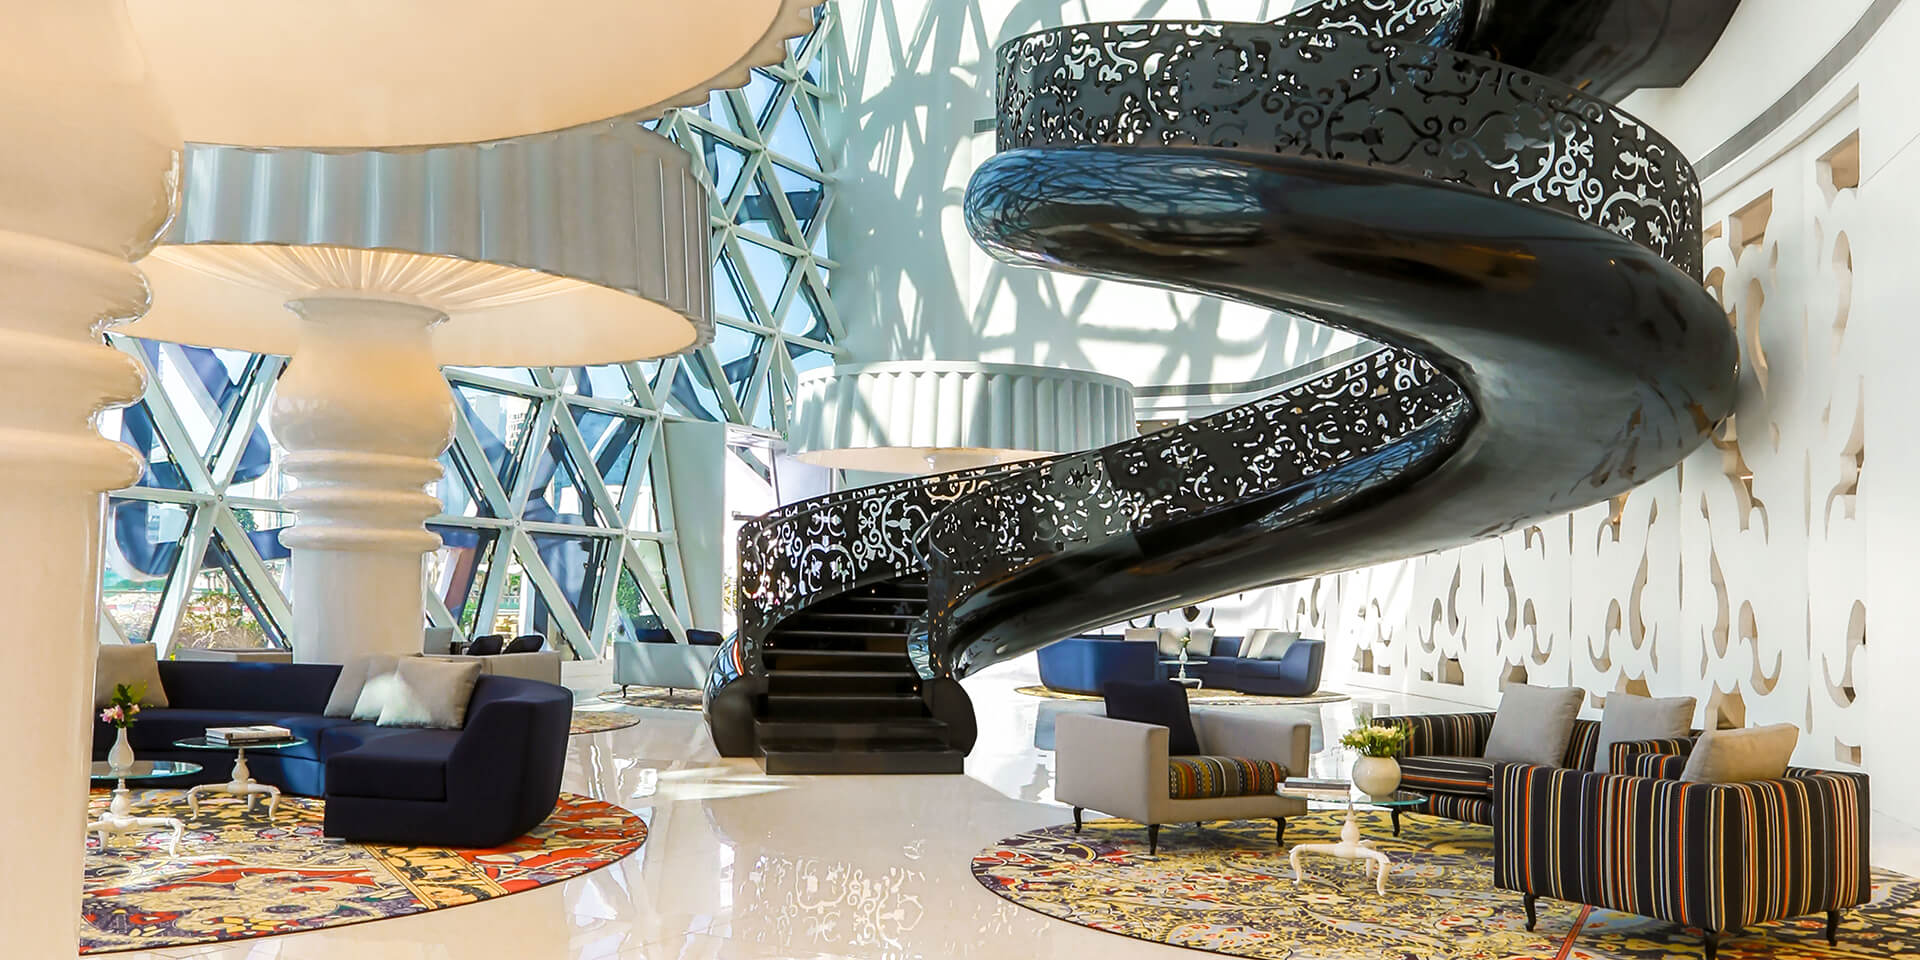 Top Interior Designers, design, interiors, designers, luxury Top Interior Designers Top Interior Designers: Marcel Wanders Mondrian Doha 01